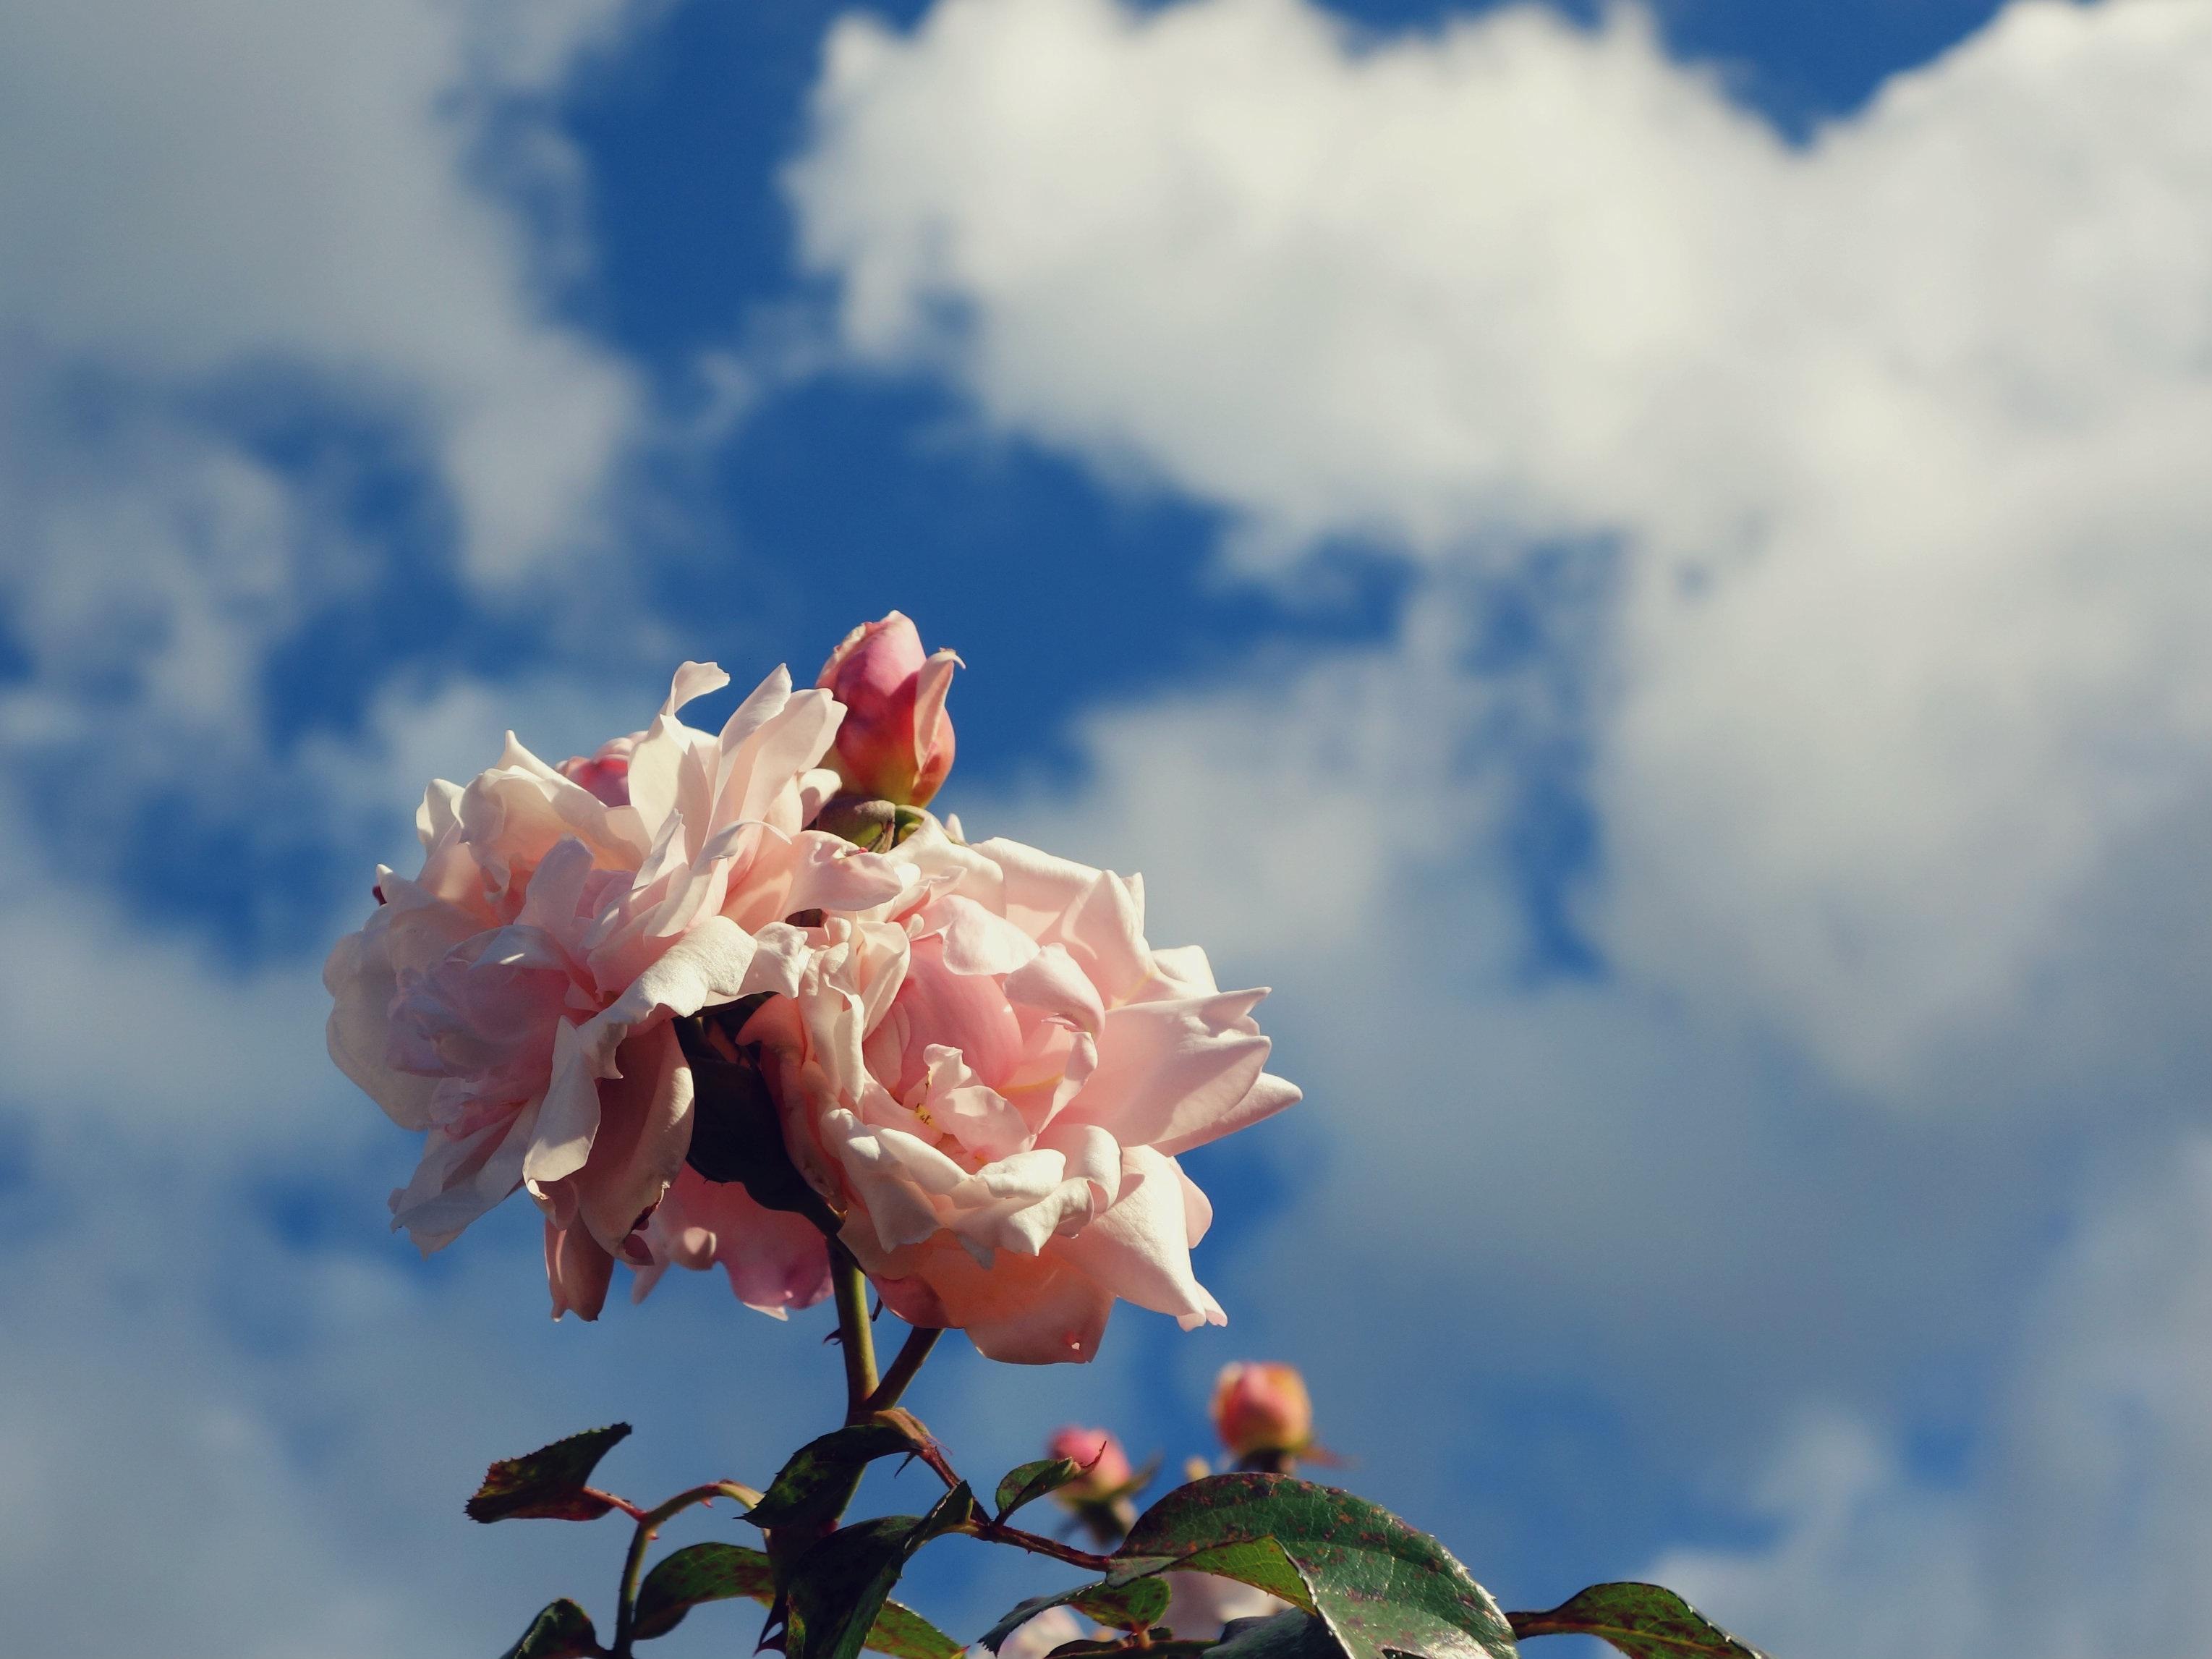 нежное облако цветов фото ней